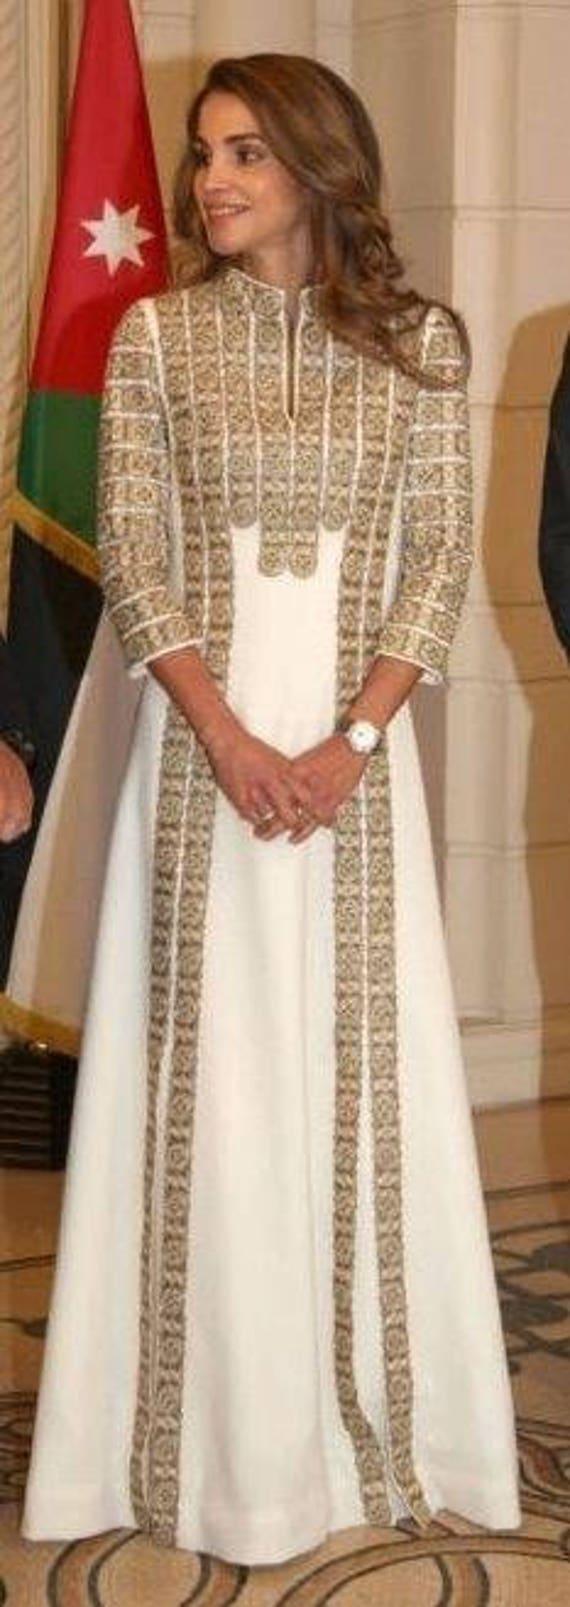 Palestine Wedding Dress